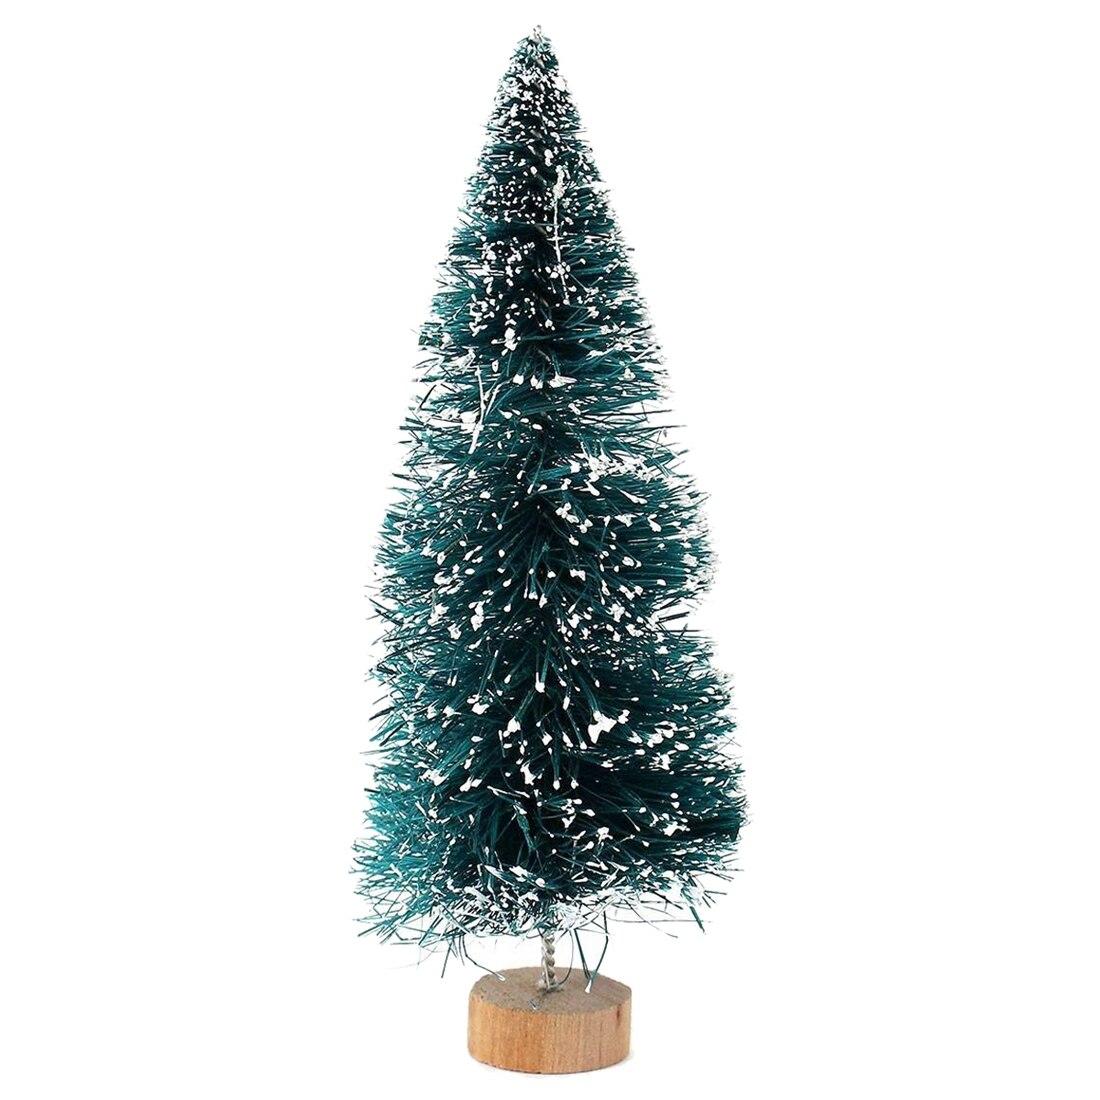 Artificial Christmas Tree Warehouse: Aliexpress.com : Buy 5 Pcs Mini Artificial Christmas Tree